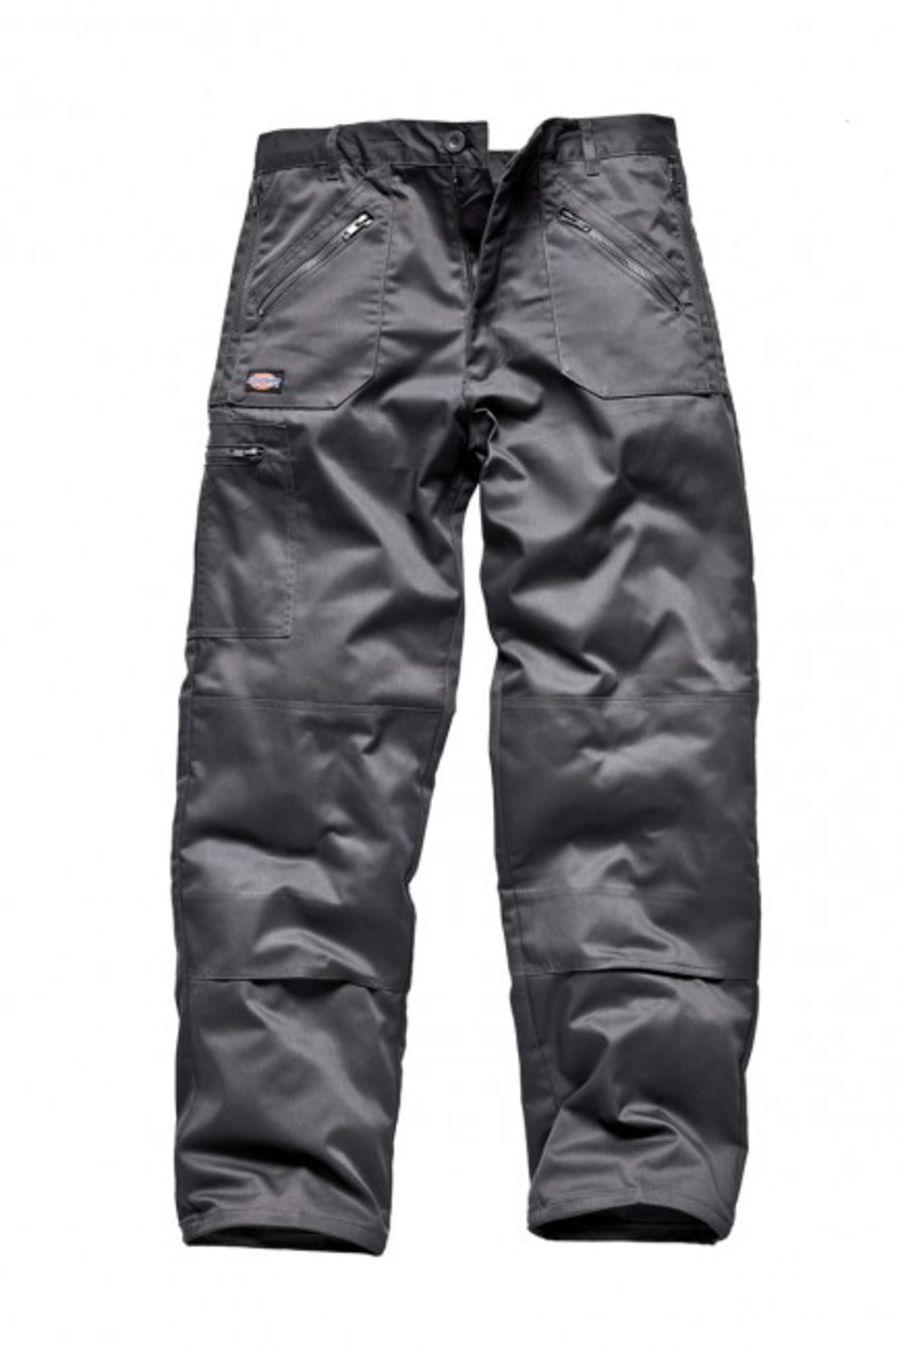 Dickies Redhawk Men's Action Trousers